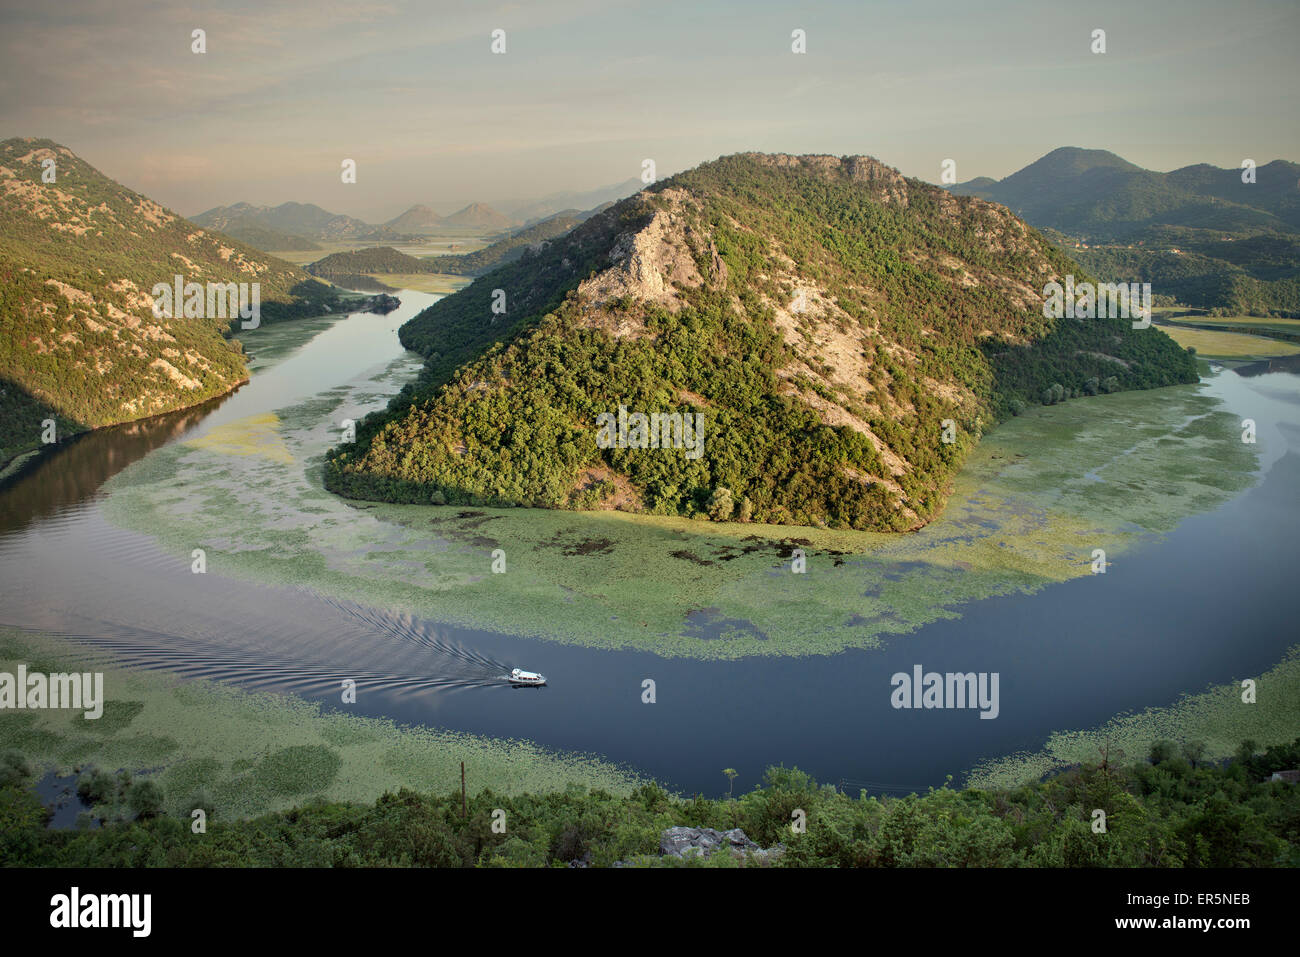 Art color rijeka - View Of The River Bend Of The Rijeka Crnojevica River With Boat Lake Skadar National